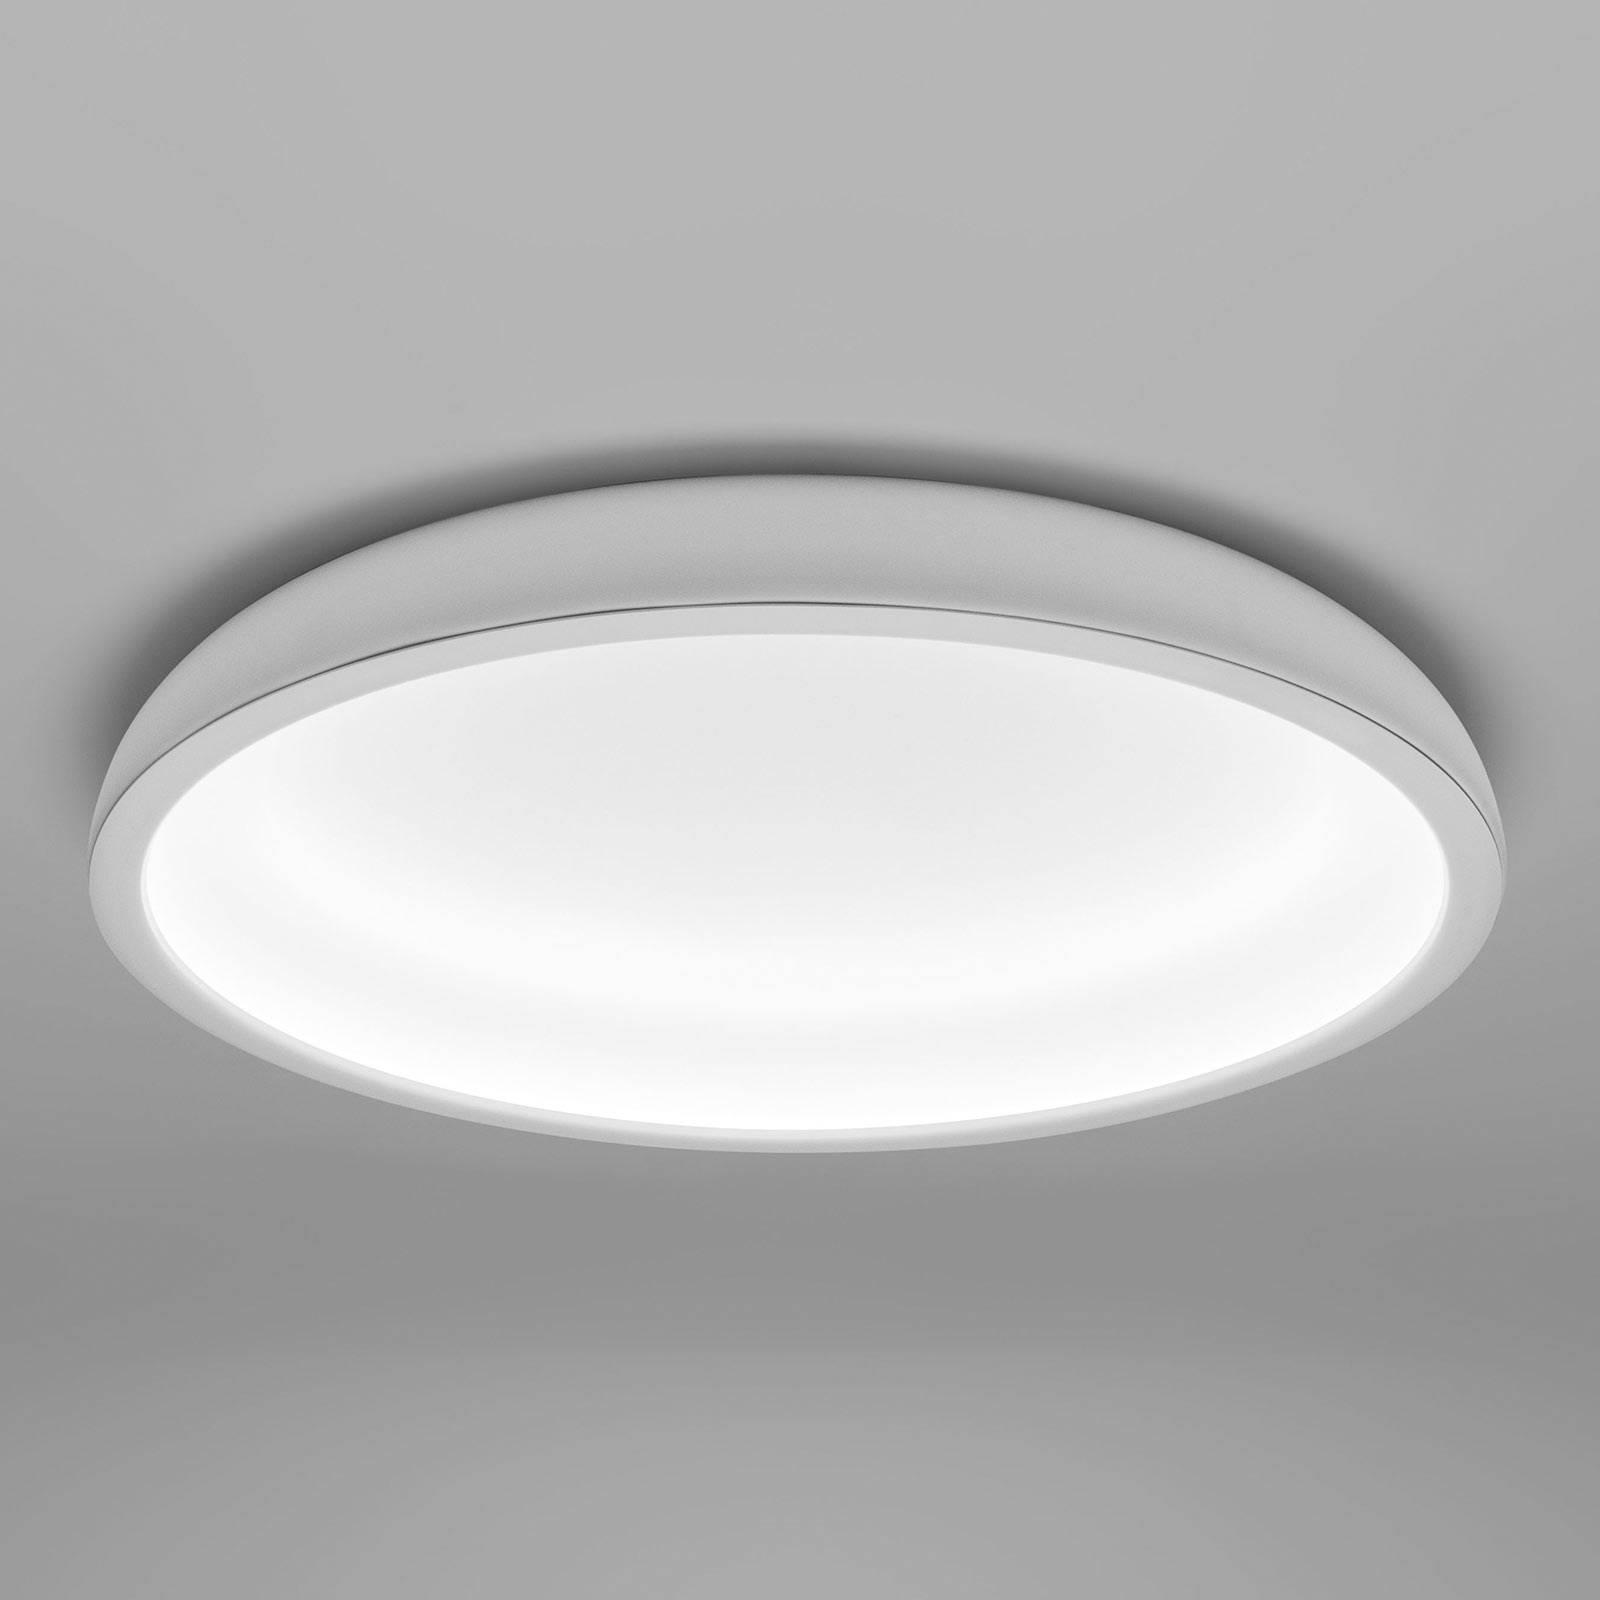 LED plafondlamp Reflexio, Ø 46cm, wit